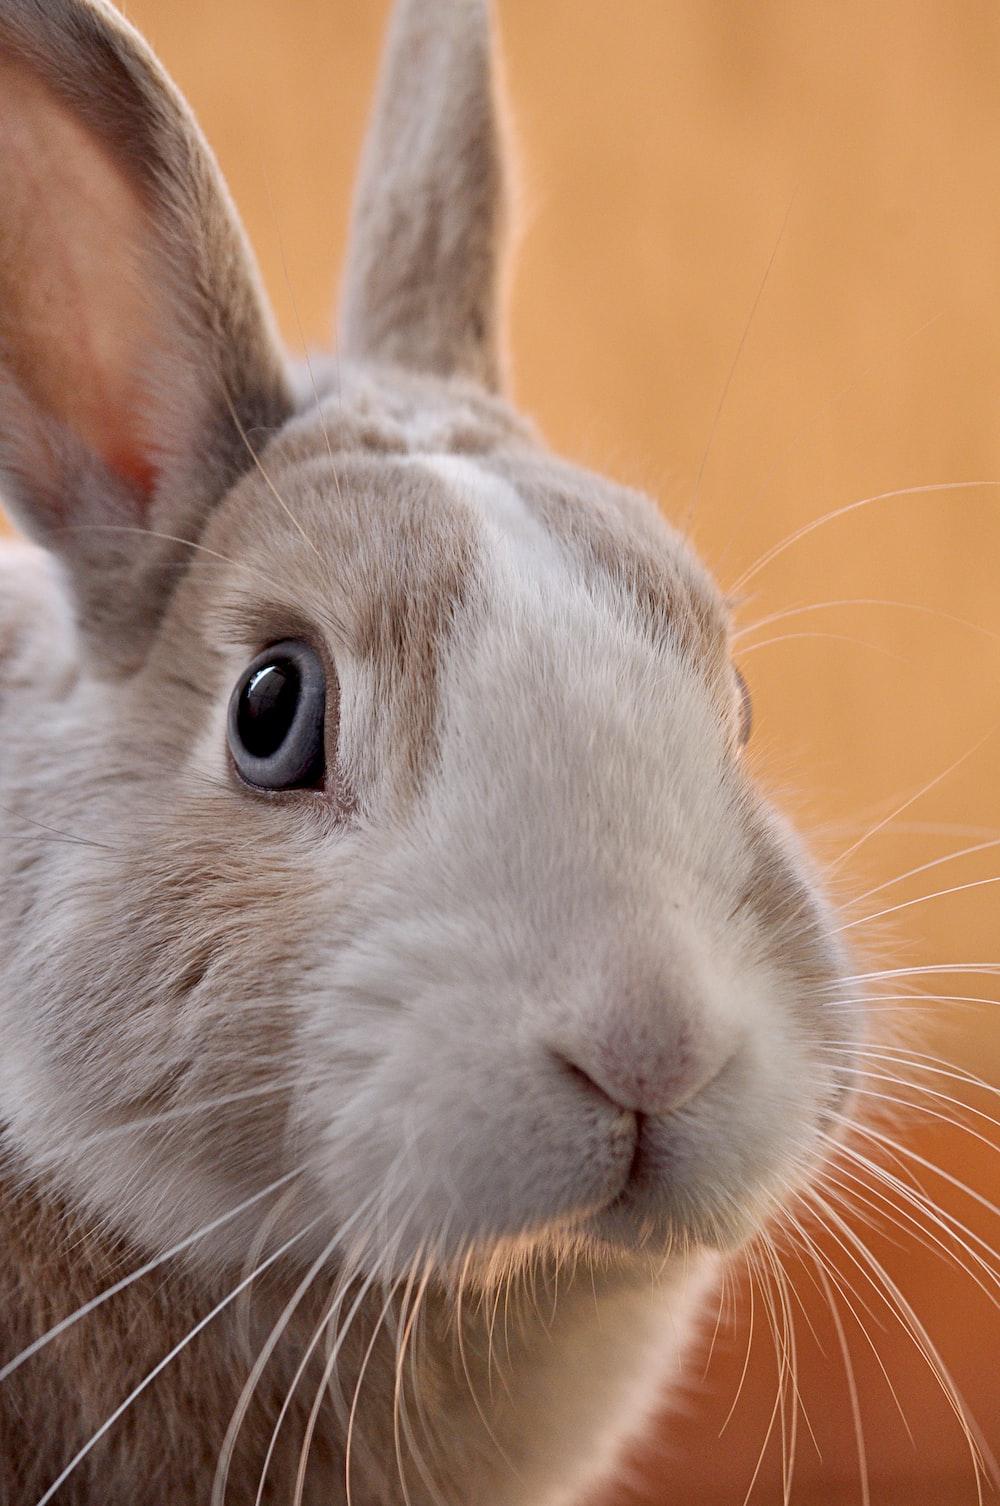 closeup photo of gray rabbit